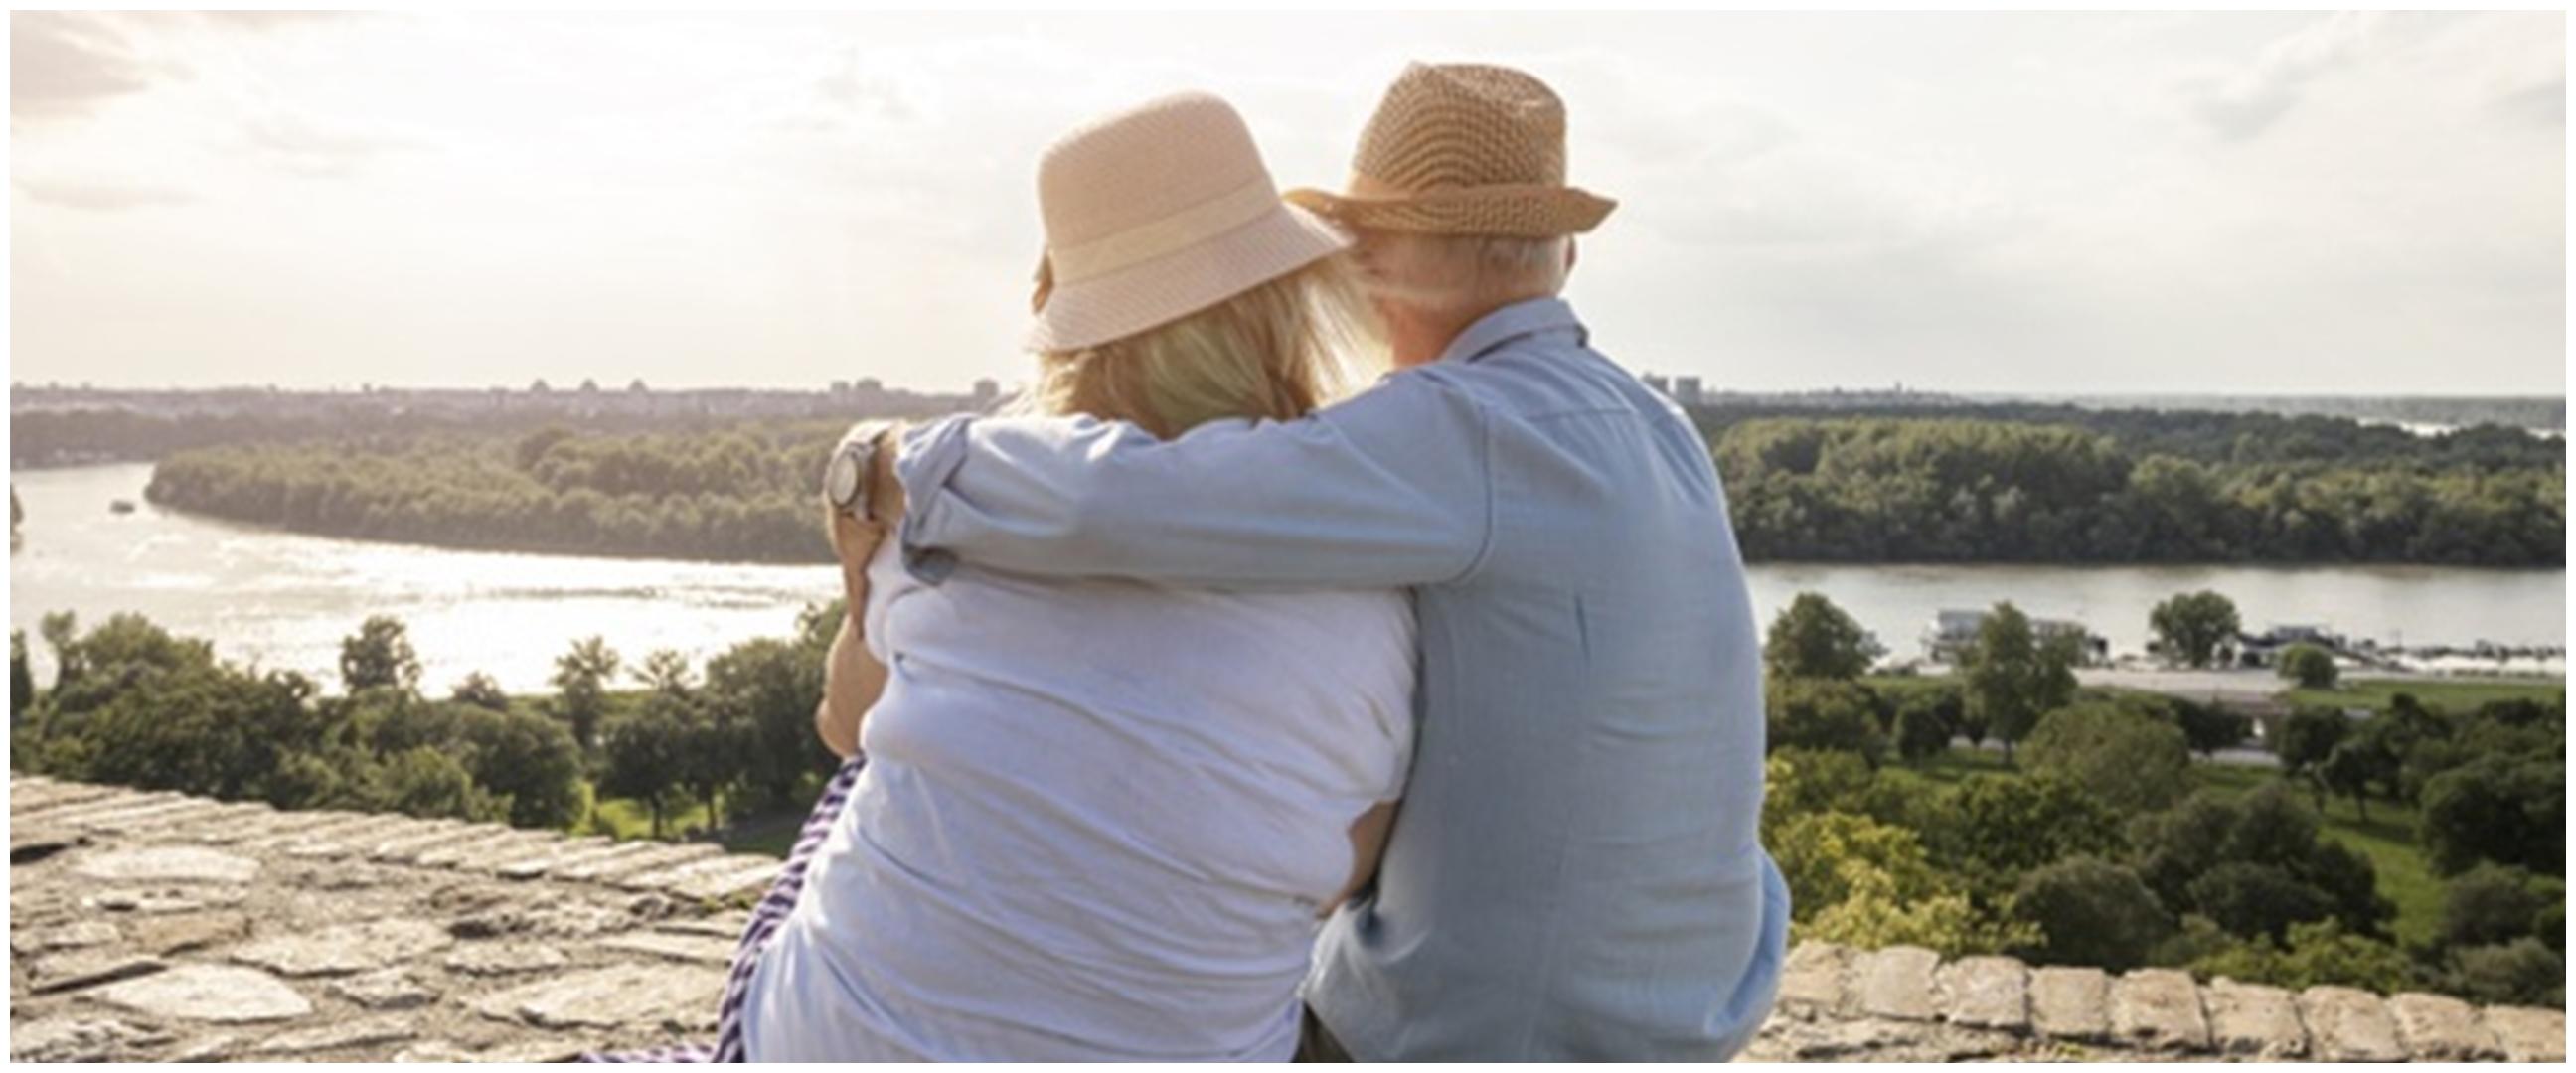 50 Kata-kata cinta mempertahankan perasaan, penuh makna dalam